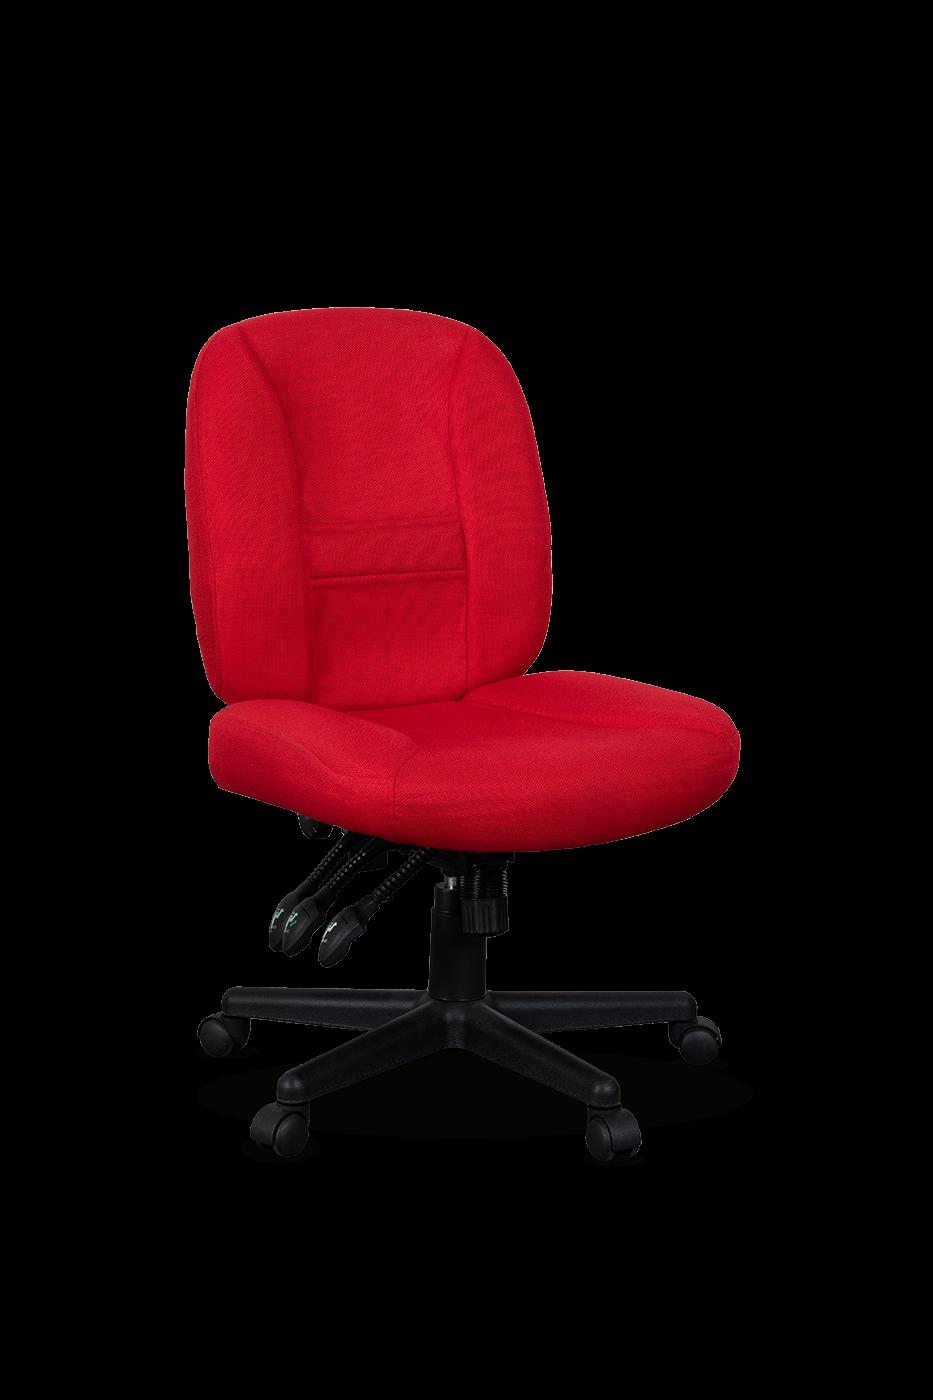 Bernina Red Chair 400 lb max